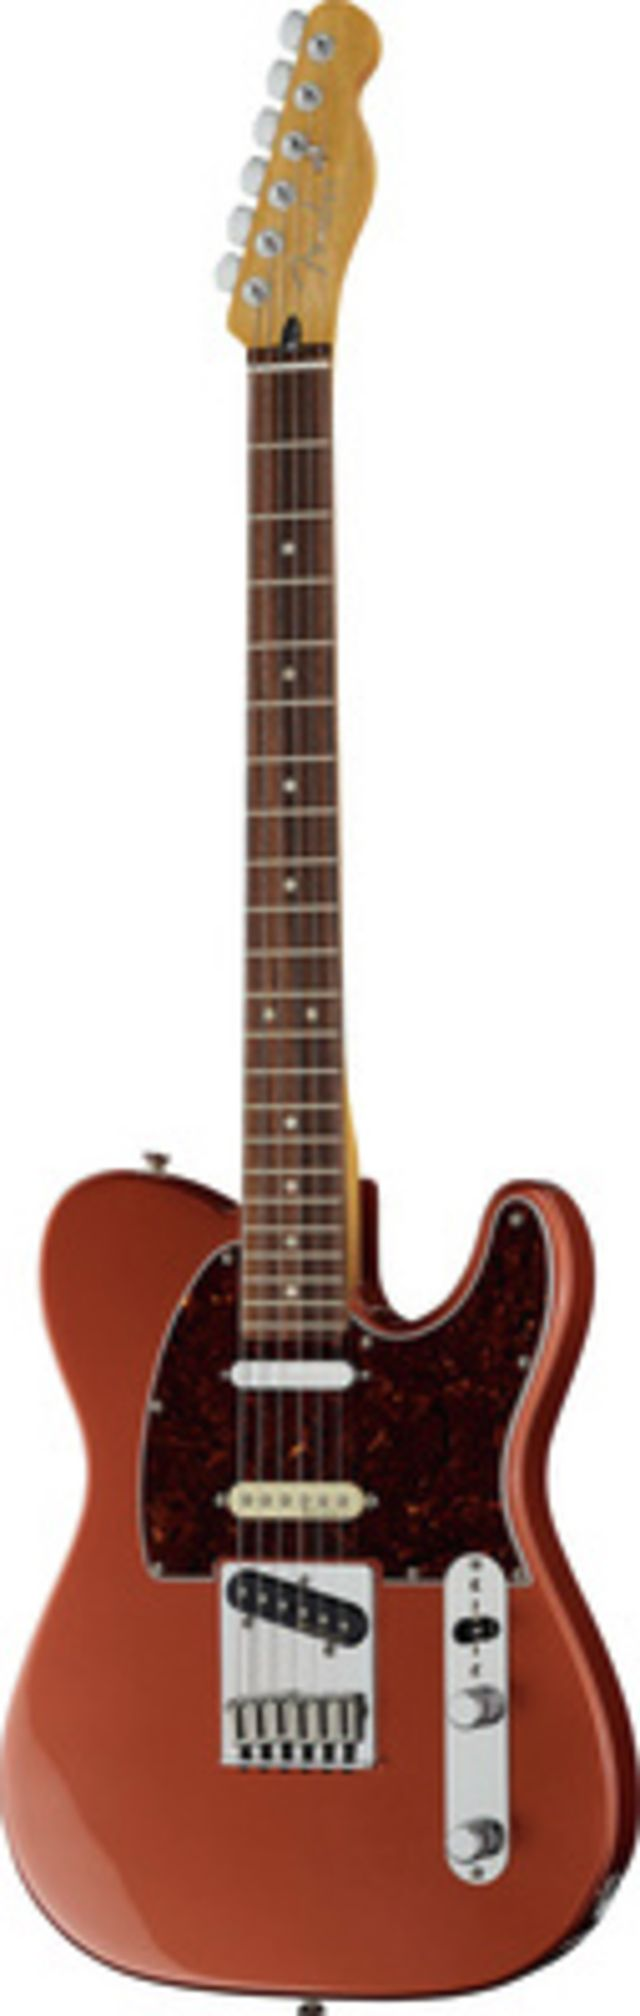 Fender Player Plus Nashv. Tele Ag.CAR